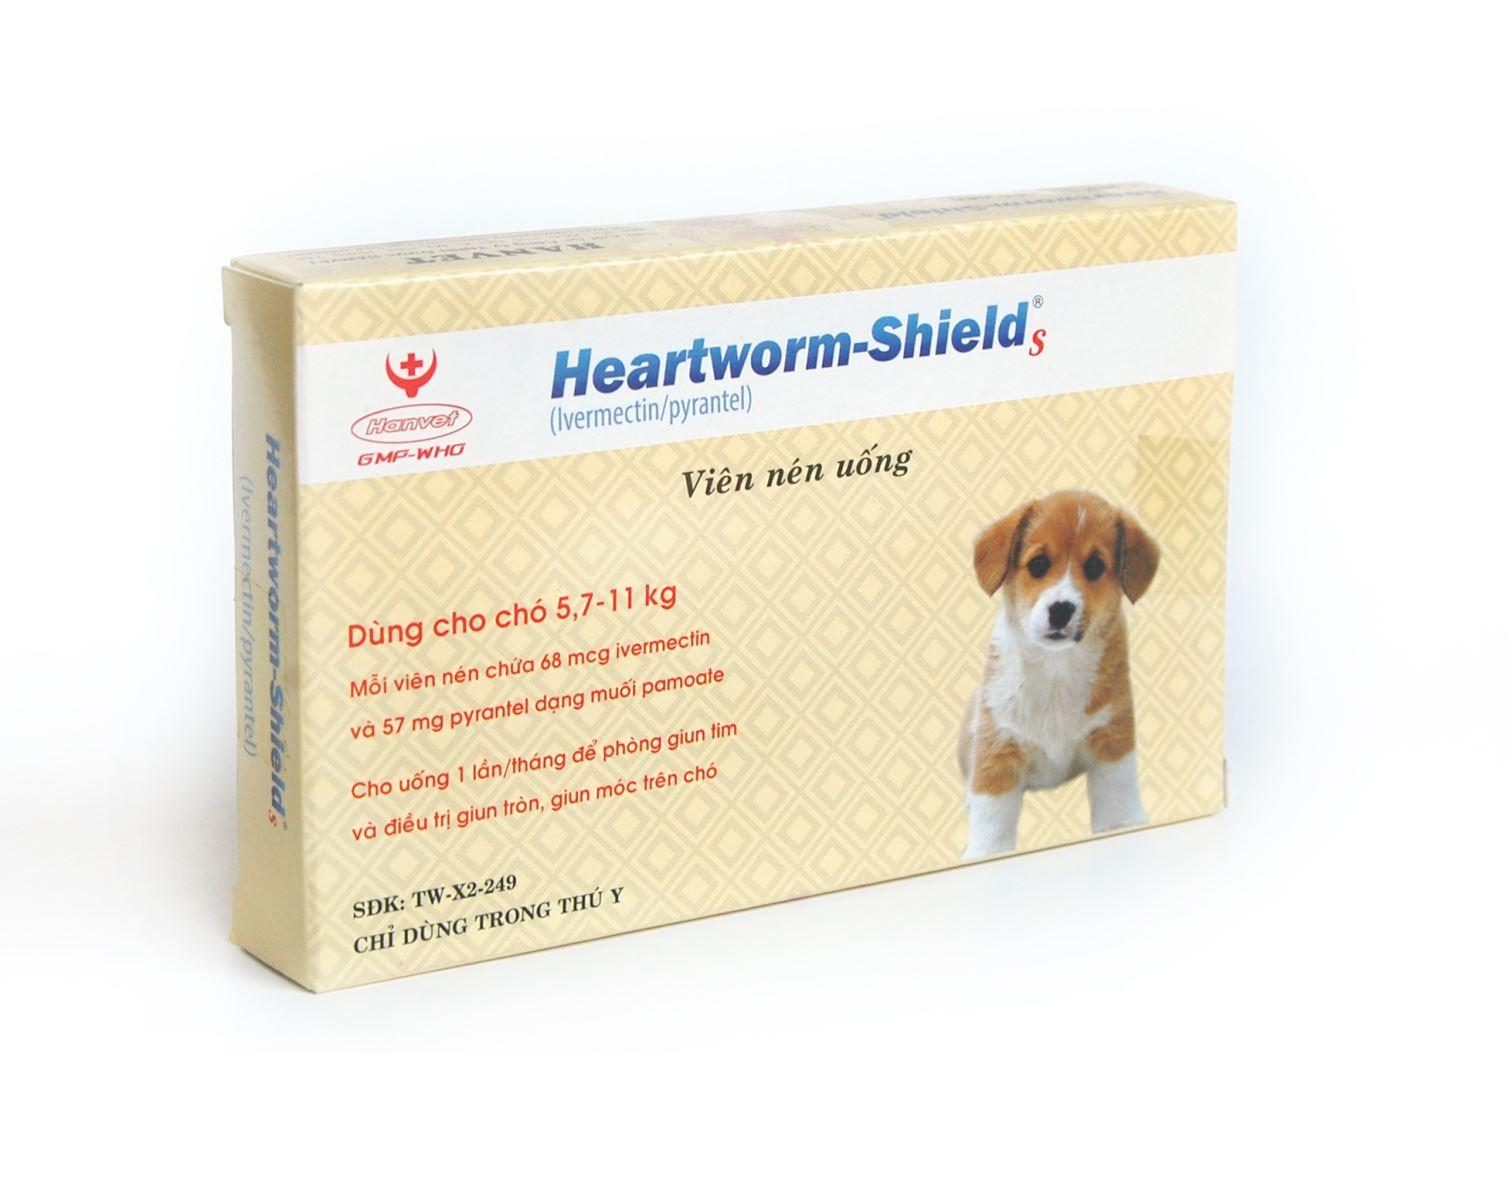 Heartworm-Shield